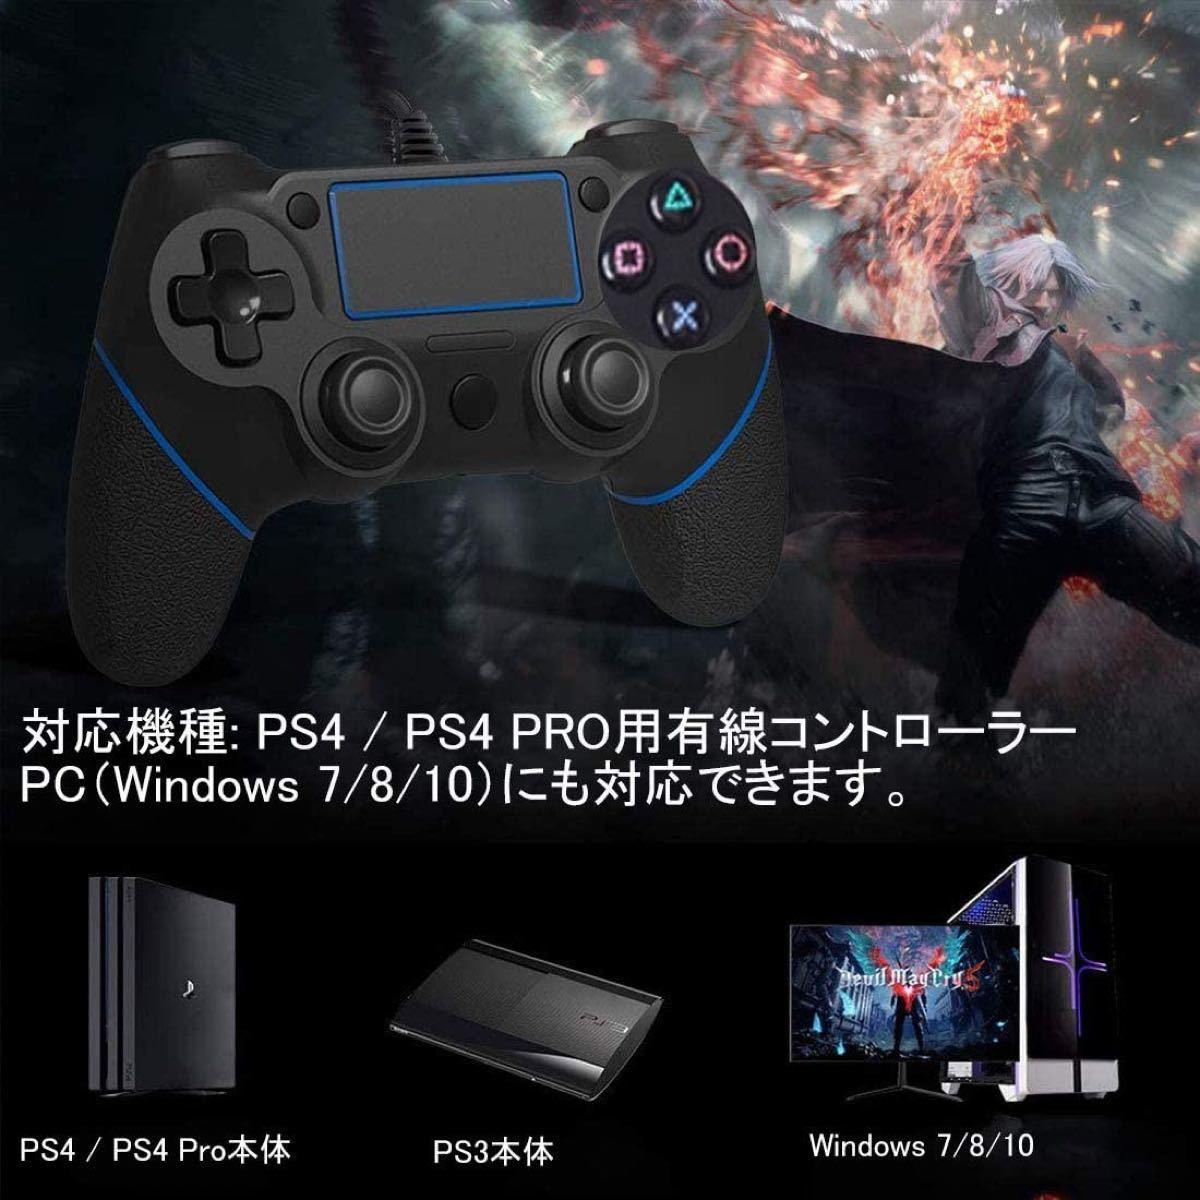 PS4コントローラー 有線 PS4/PS4PRO/win7/8/10